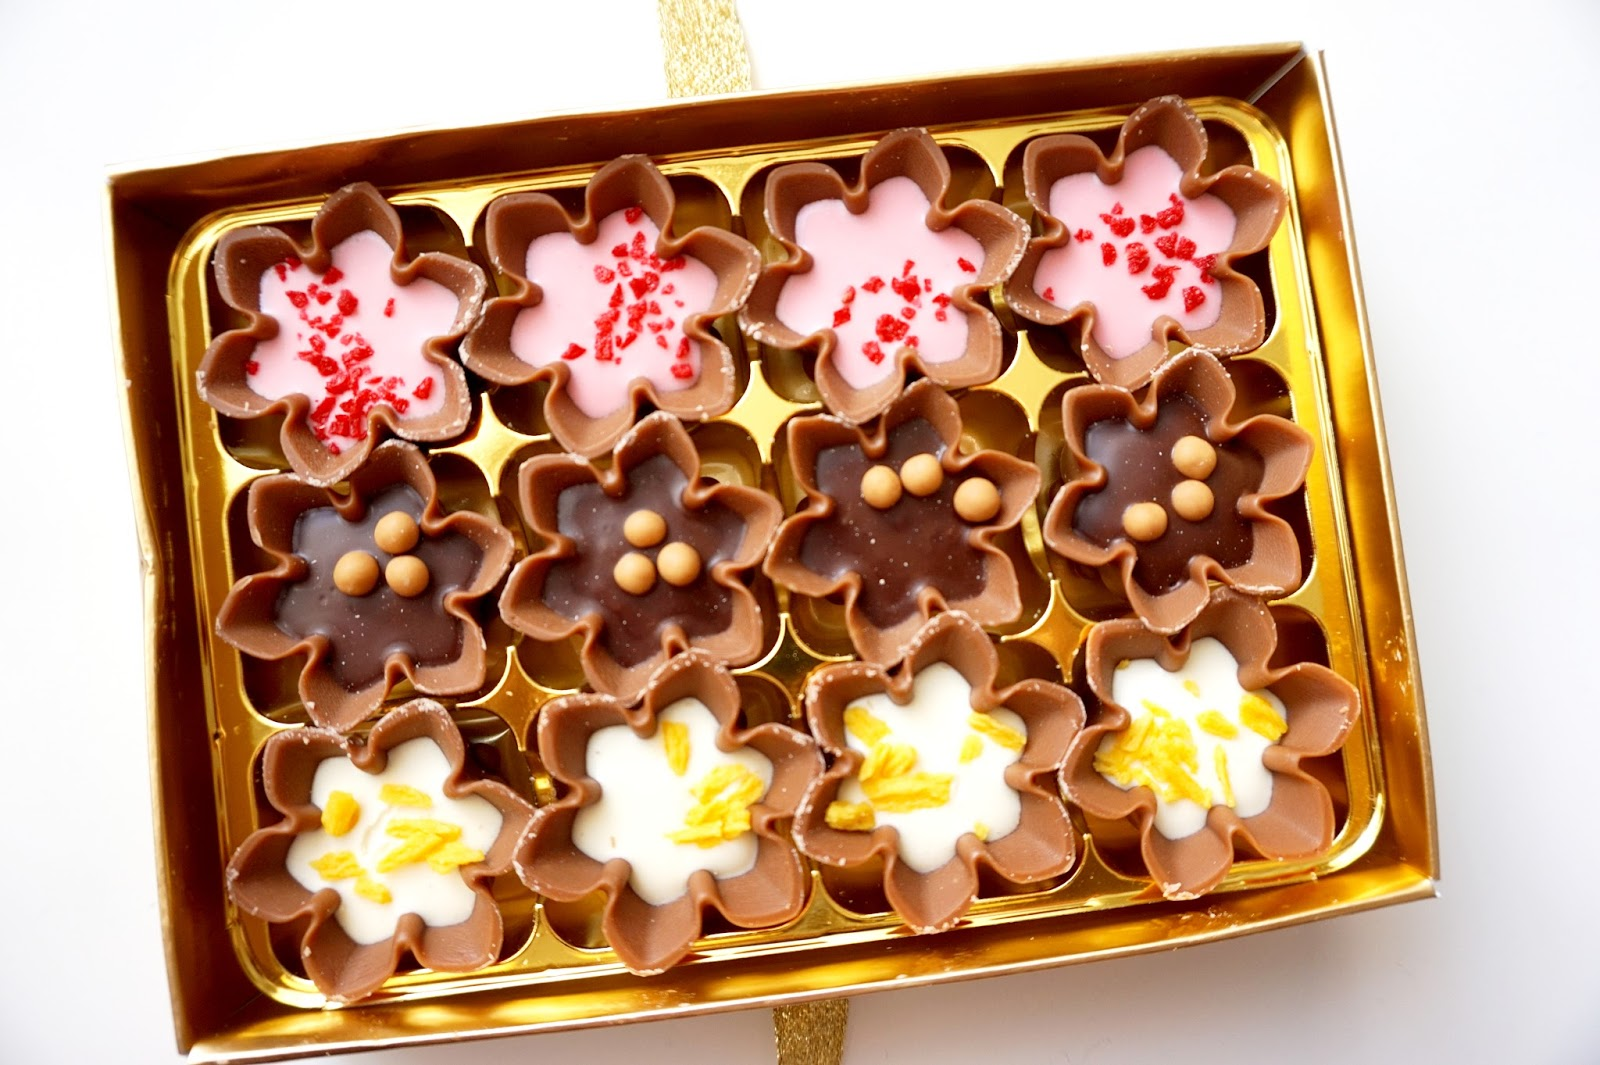 Chocolates For Chocoholics Review Life As Mum